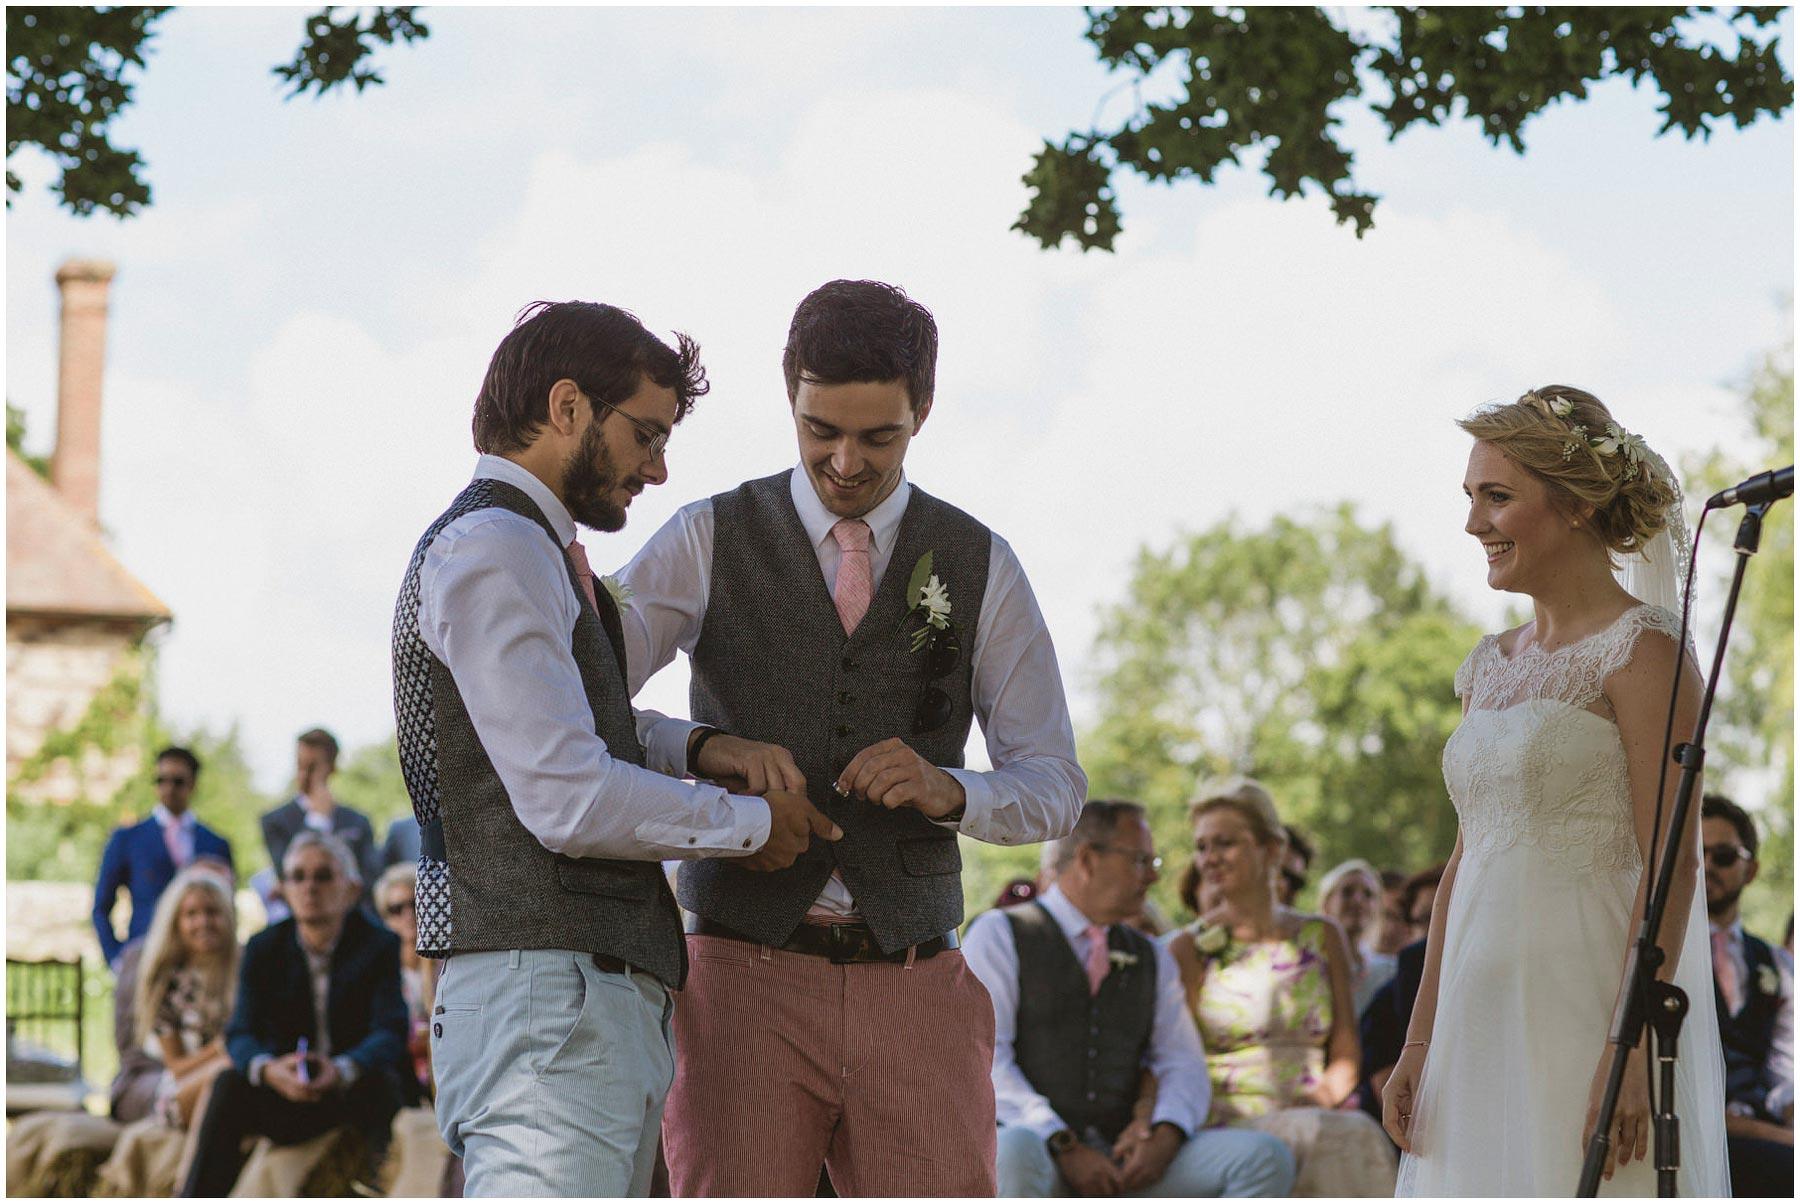 Kent-Festival-Tipi-wedding-photography_0071